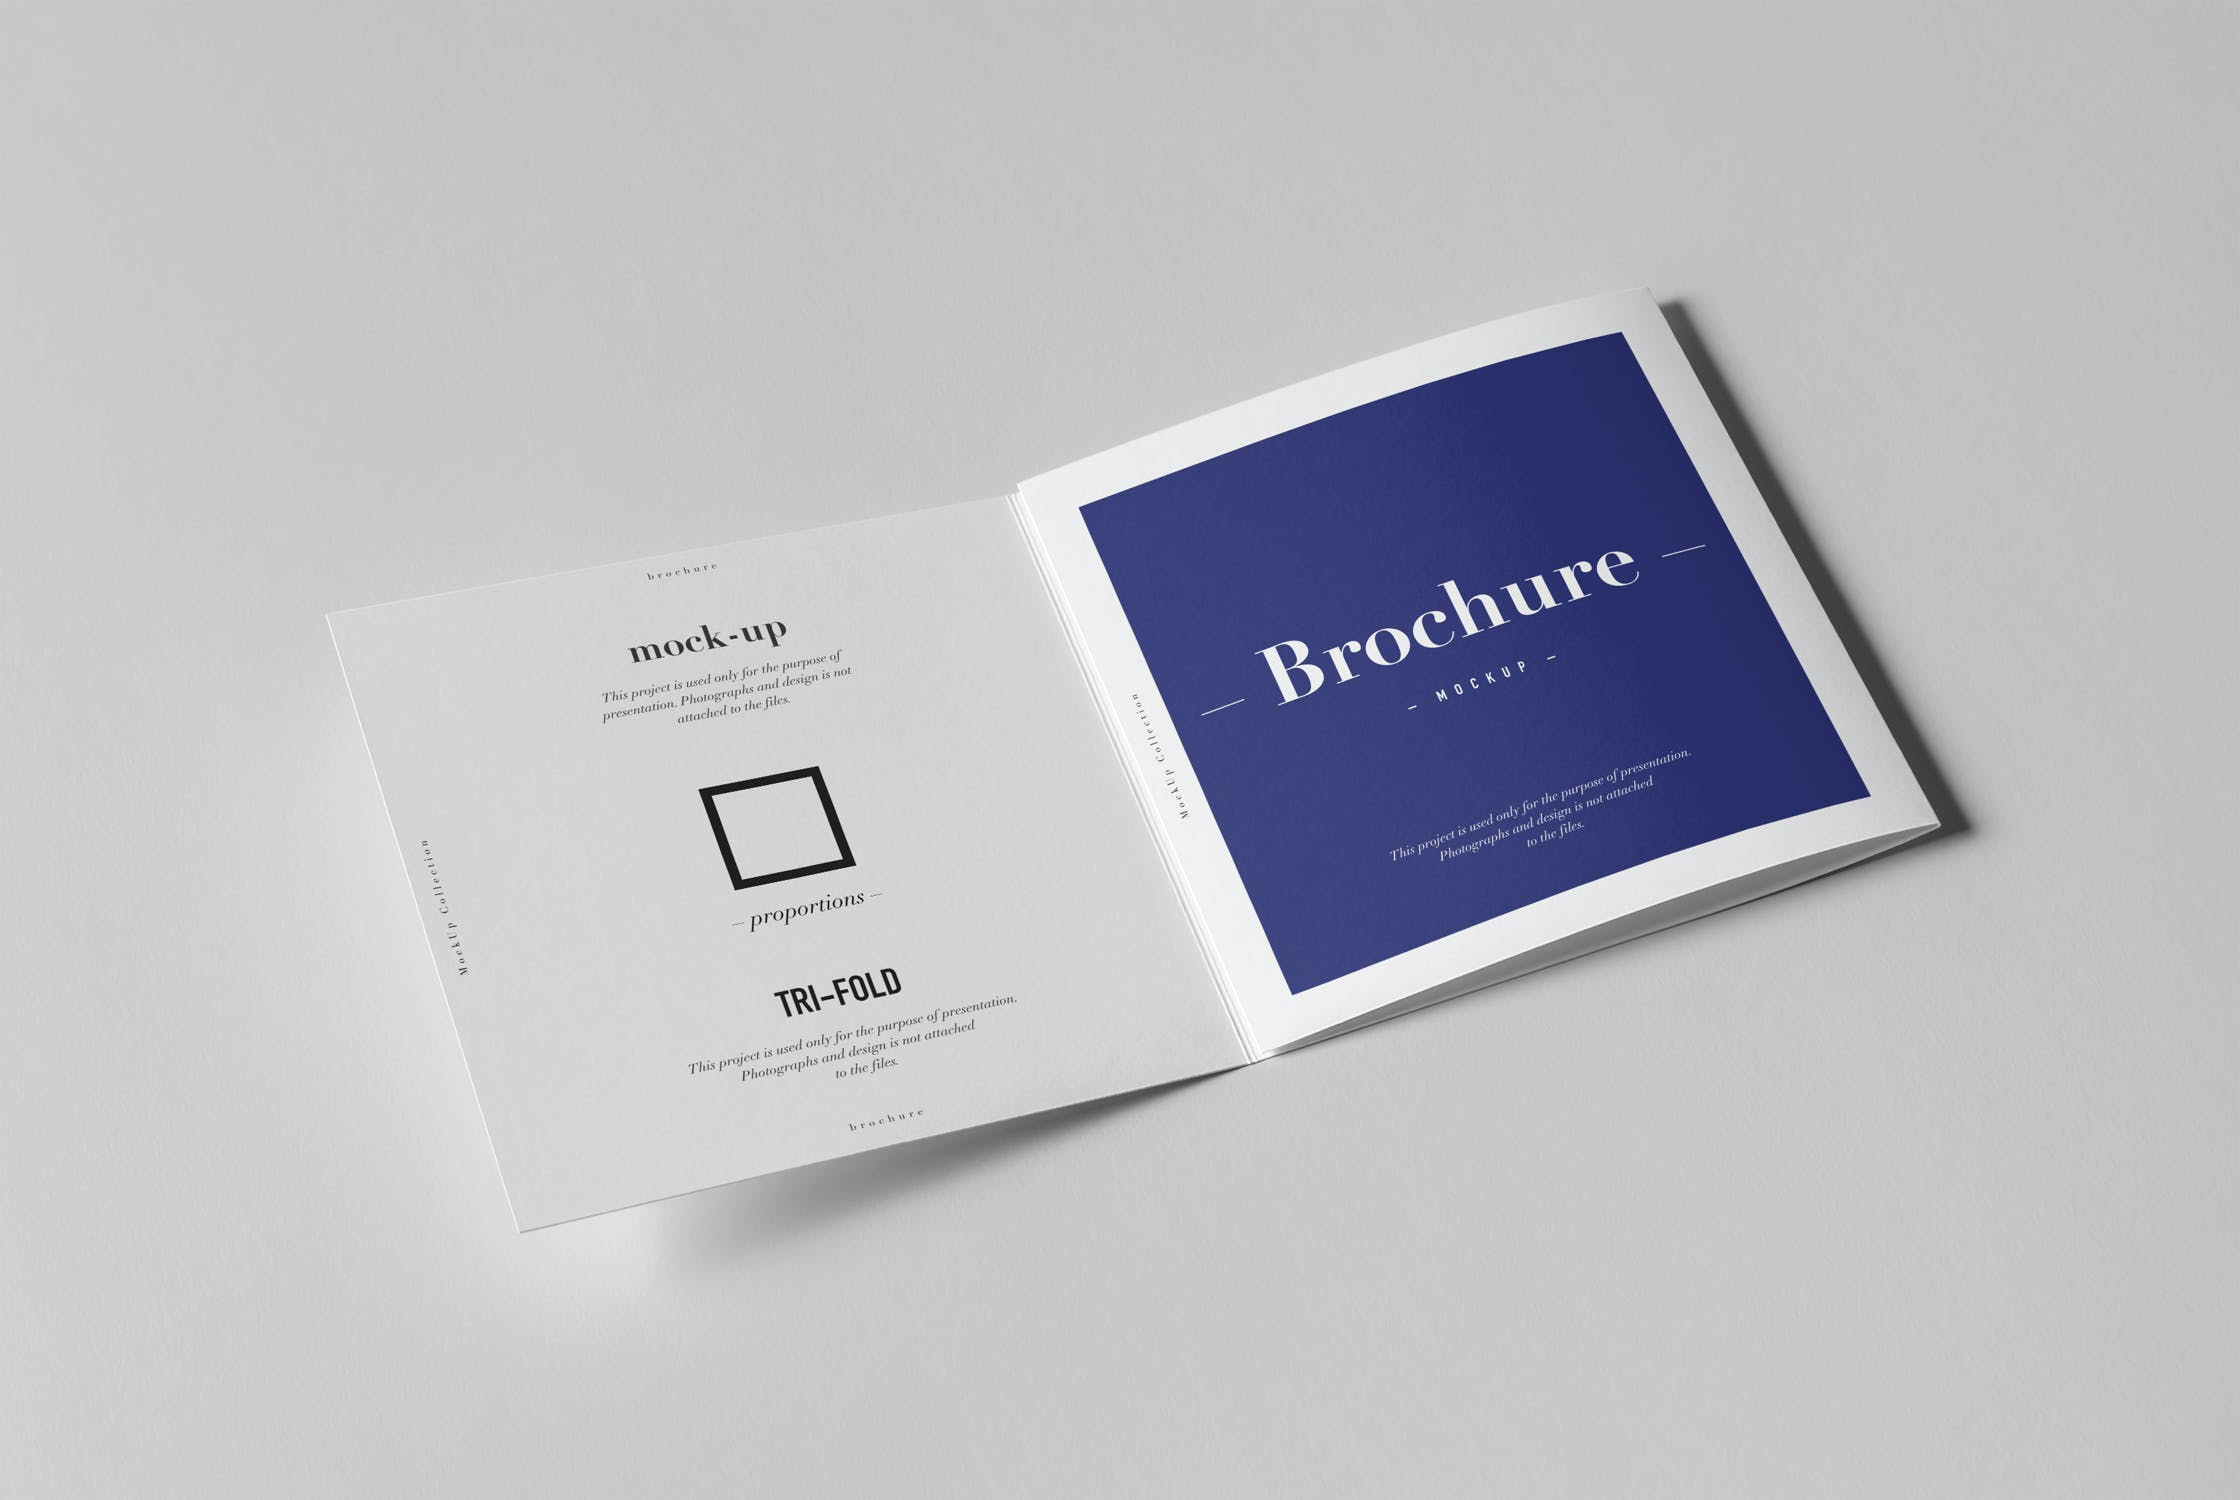 8款三折页小册子设计展示样机模板 Tri-Fold Square Brochure Mockup插图(3)